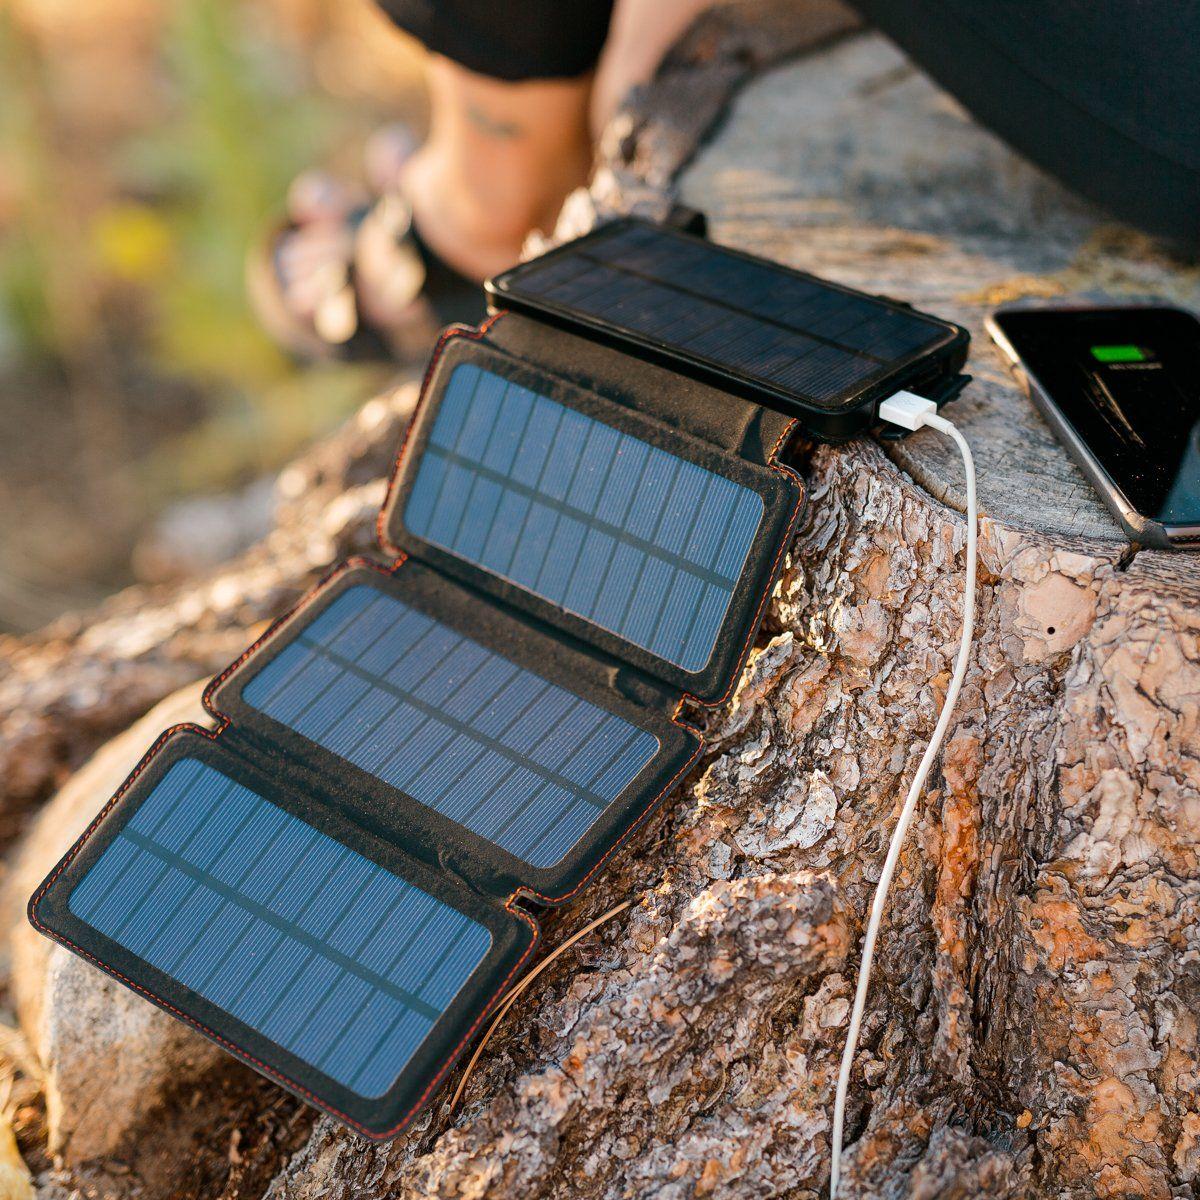 Quadrapro Solar Power Bank With Wireless Dual Usb Charging By Frog Co Solar Power Bank Solar Charger Portable Solar Power